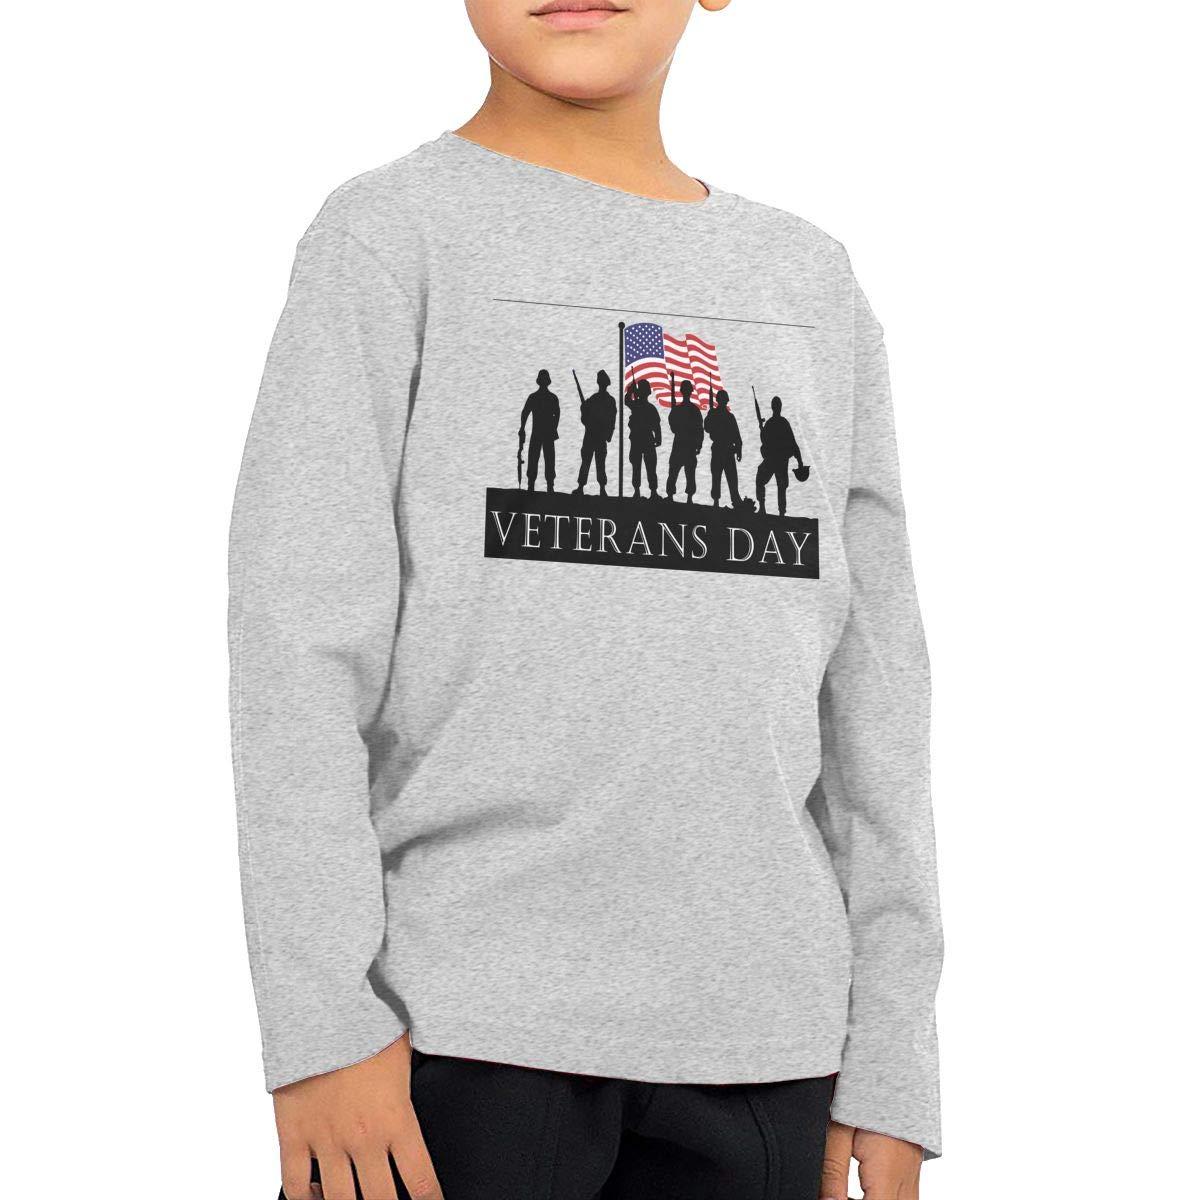 UGFGF-S1 Veterans-Day Fashion Toddler Children Baby Boys Girls Long Sleeve T-Shirt Top/&Tee